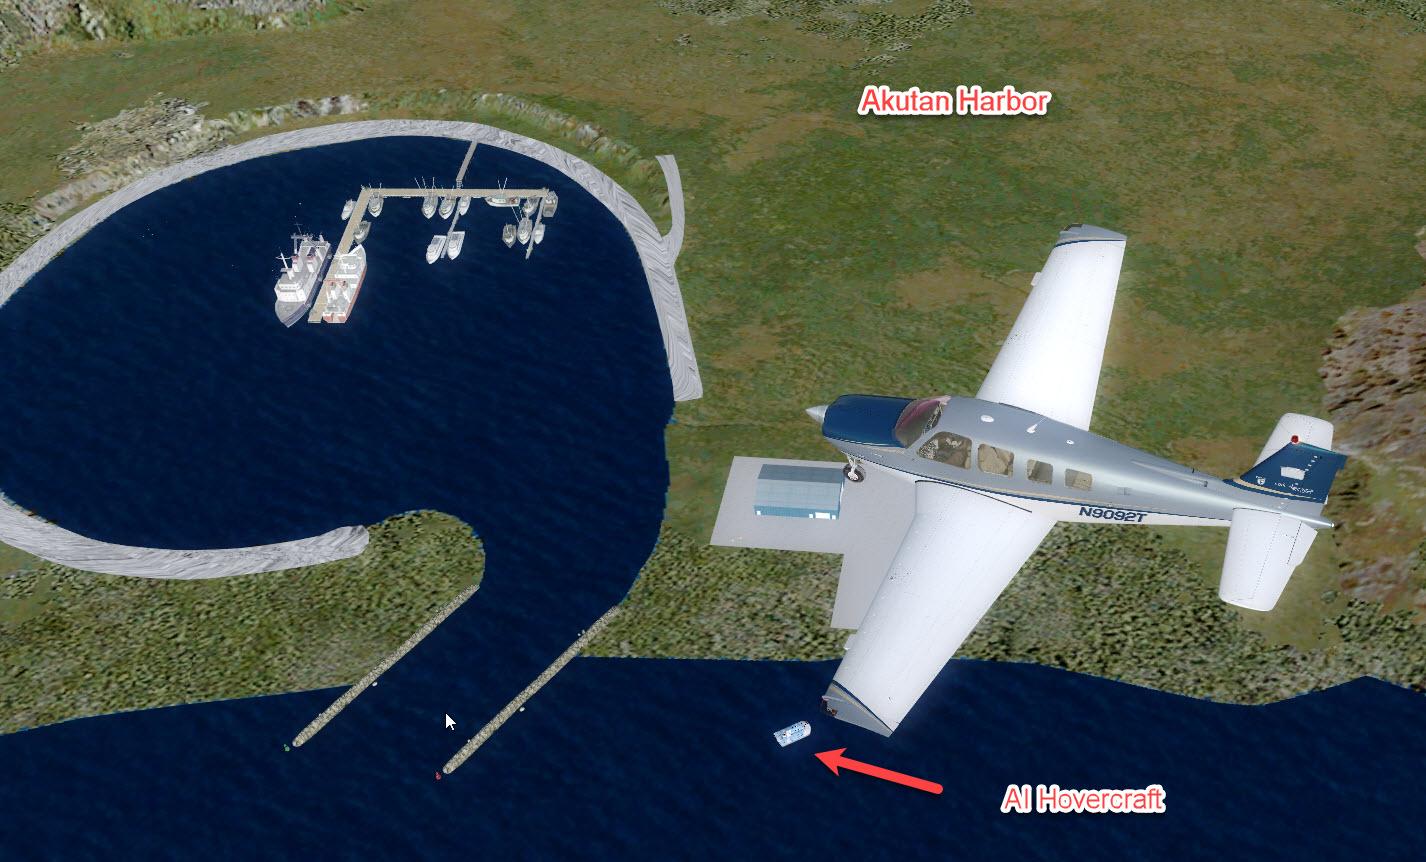 7AK Akutan Harbor-1.jpg